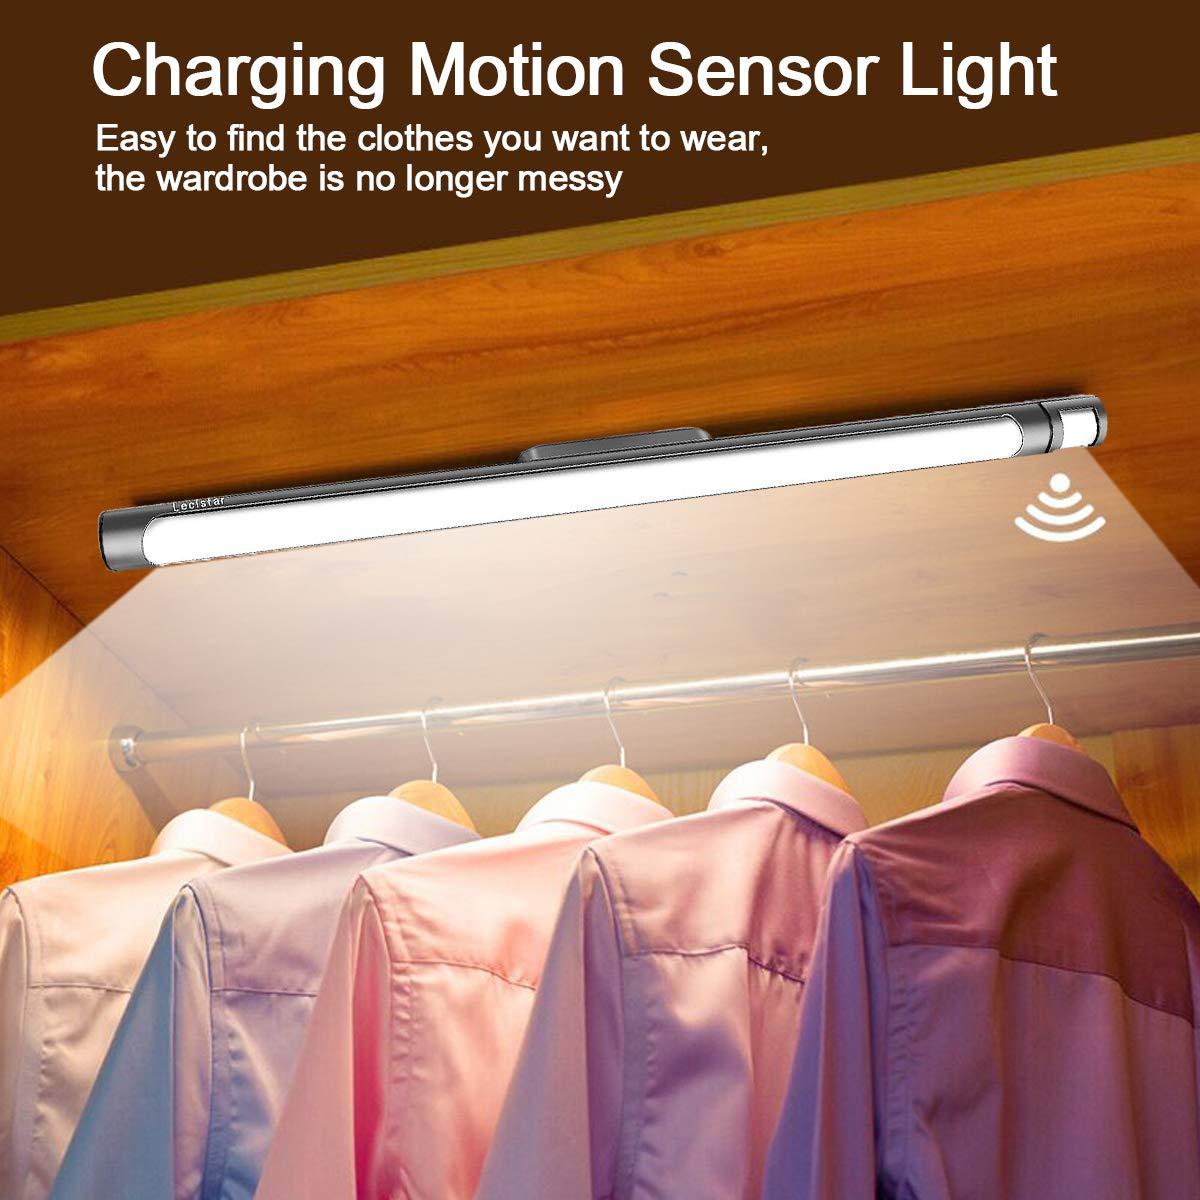 LECLSTAR Motion Sensor Closet Lights for Under Cabinet Lighting,51 LED Wireless Closet Lights Battery Operated Motion Sensor Closet Light Motion by LECLSTAR (Image #2)